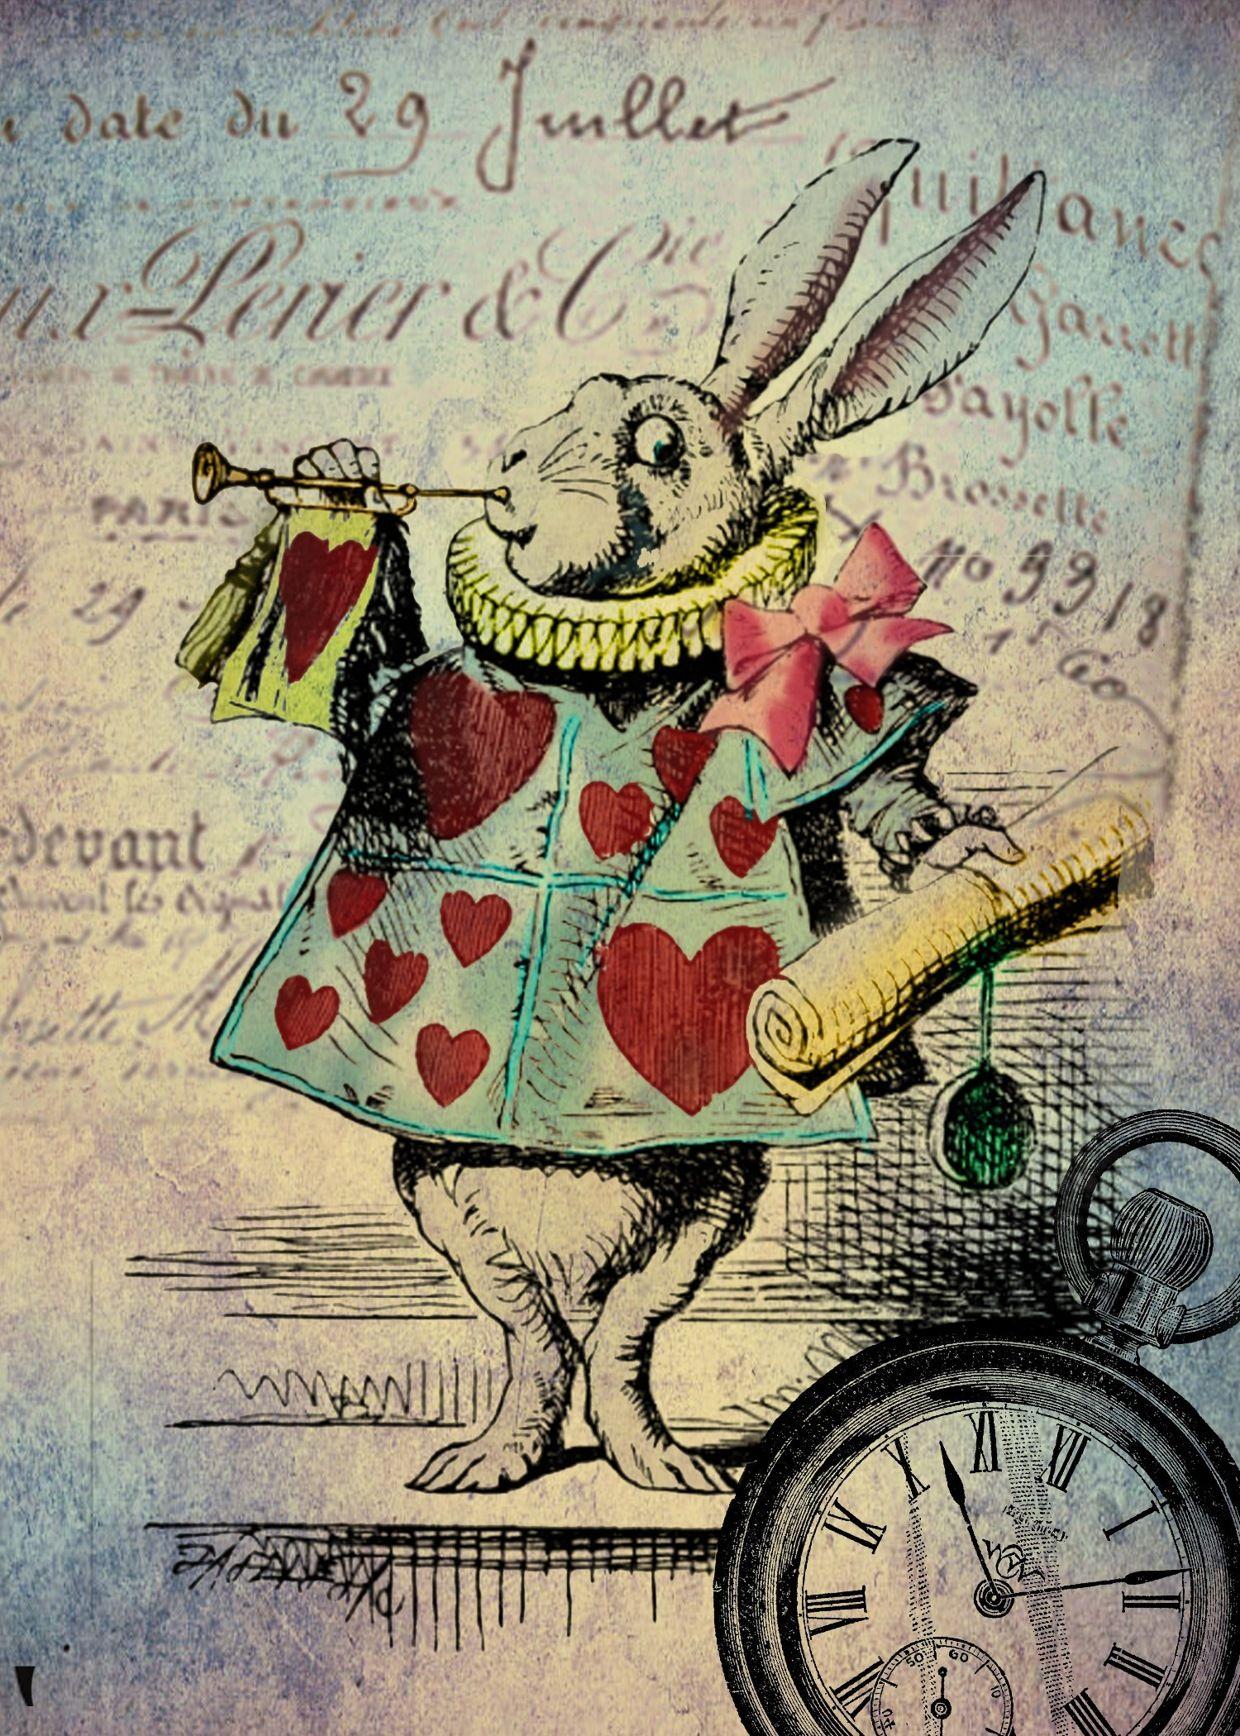 Digital Art Alice in Wonderland on Behance